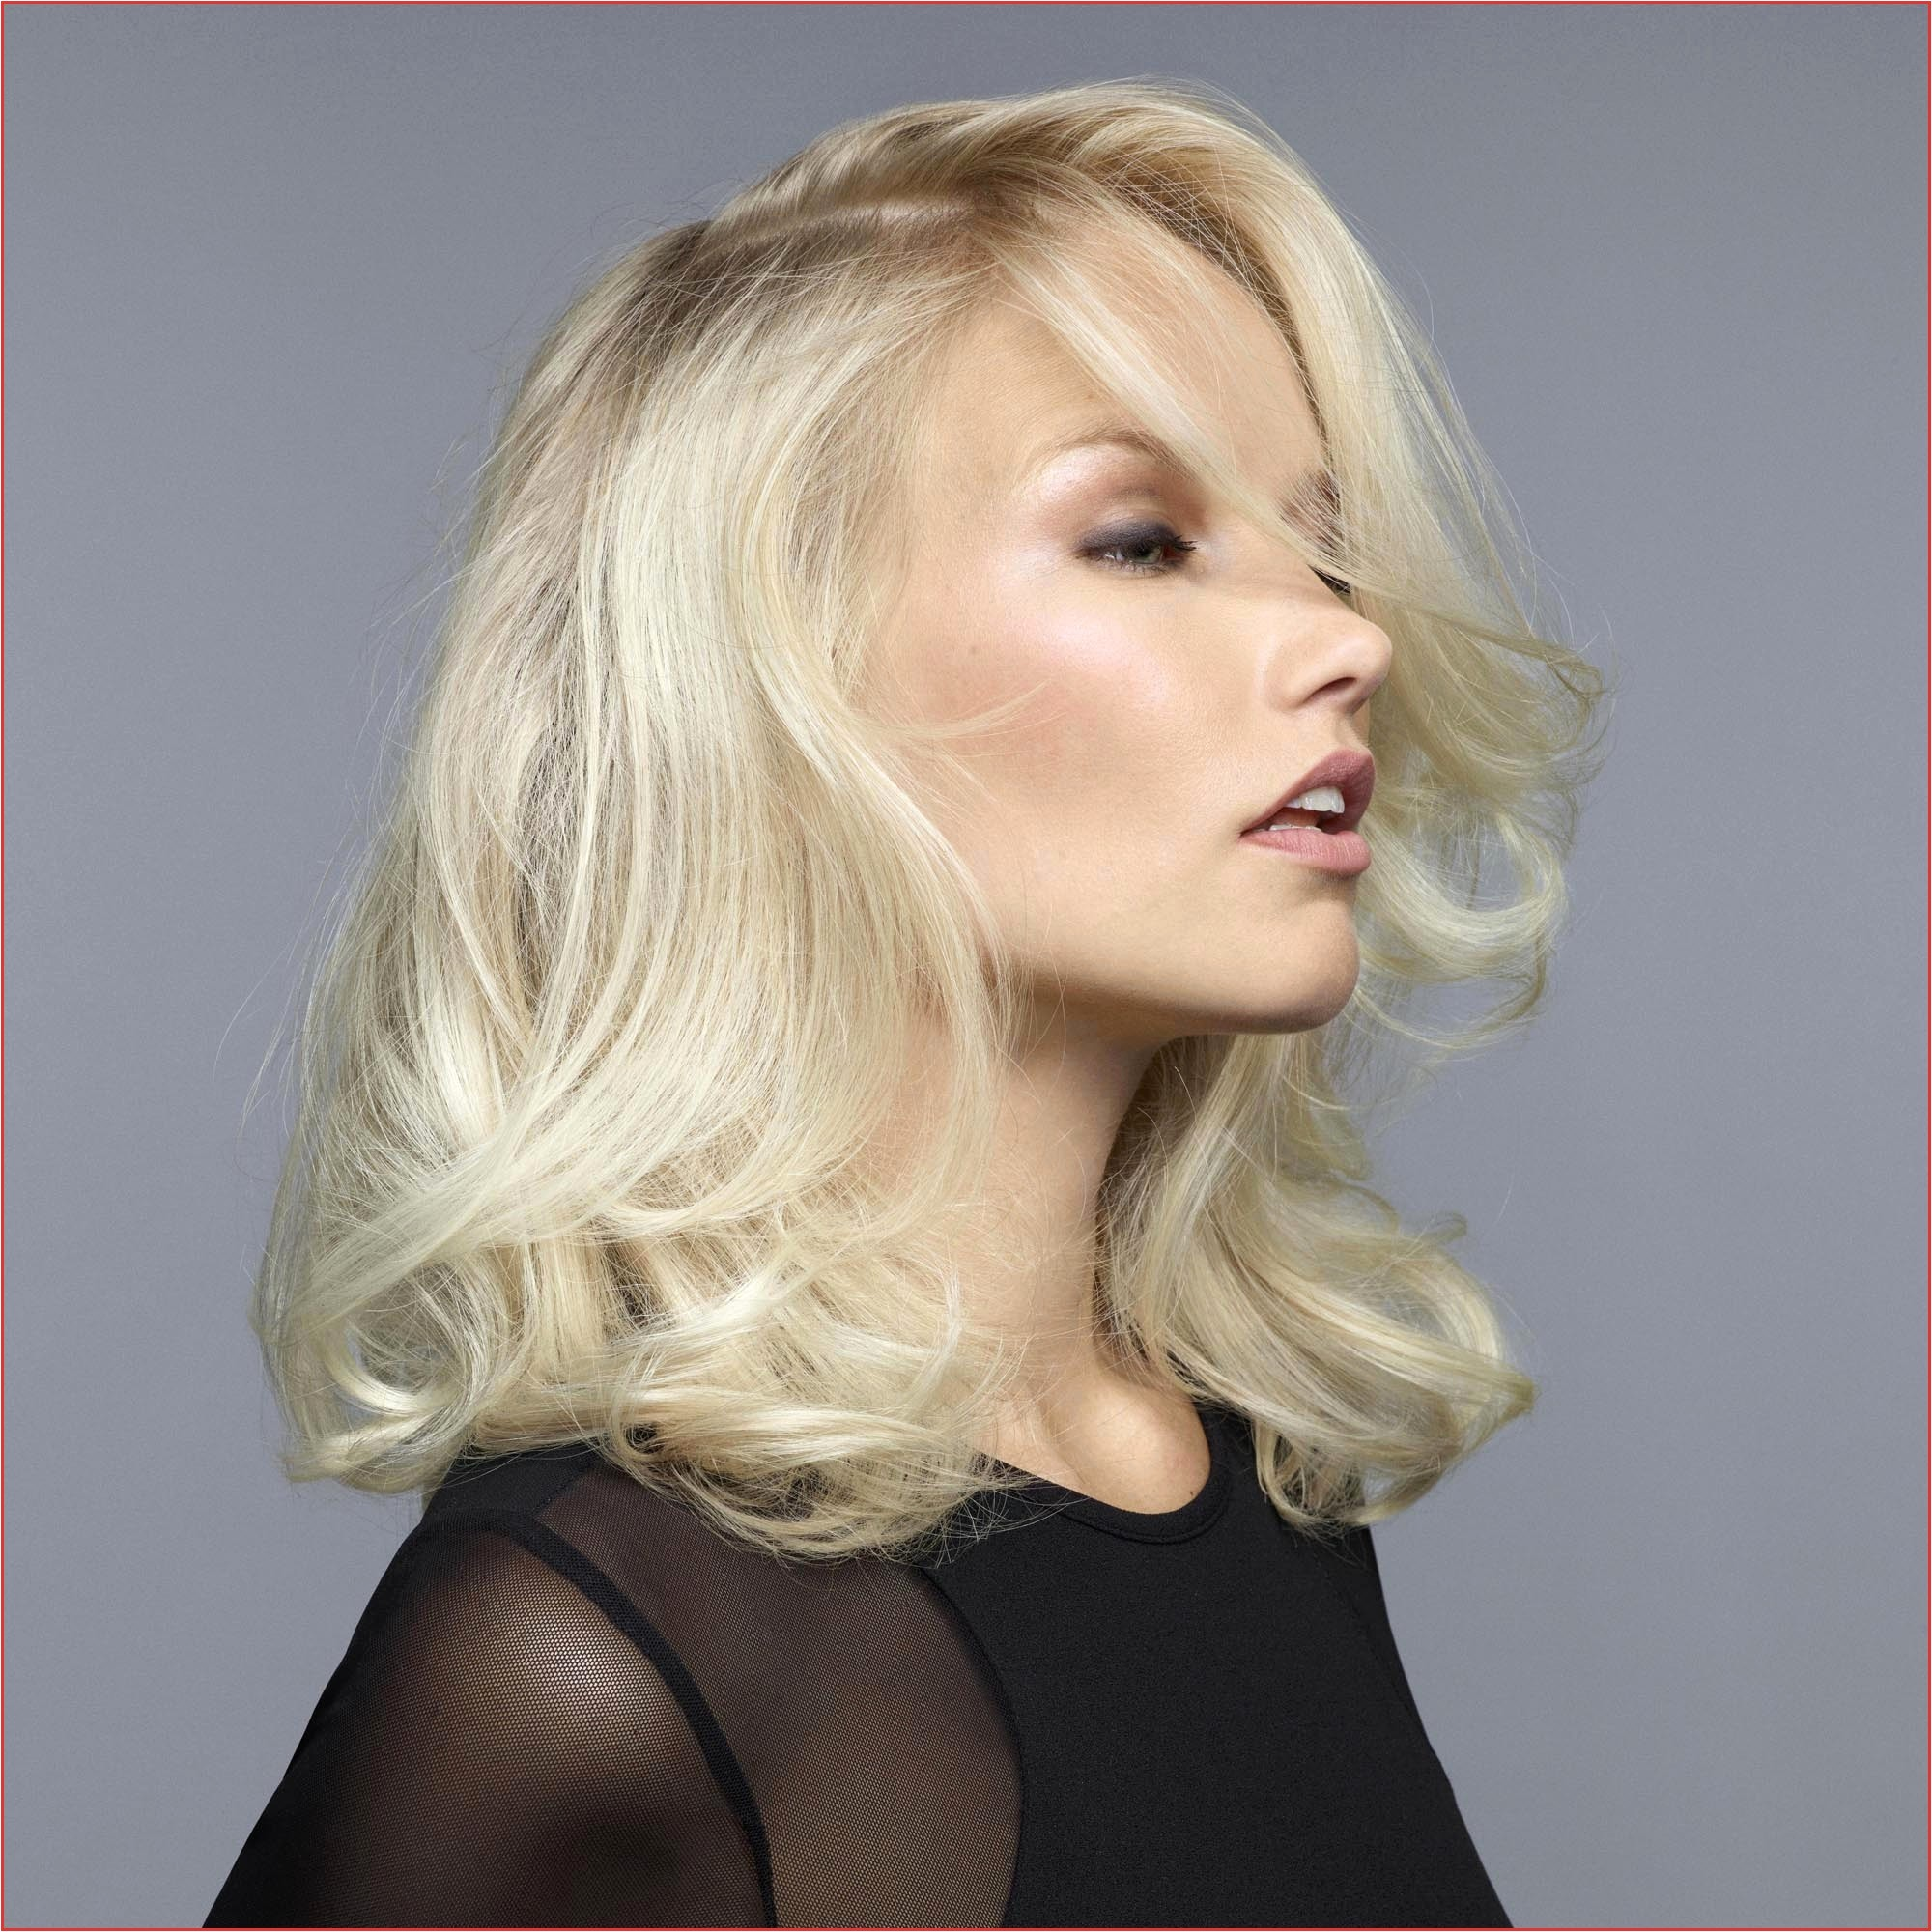 Pinterest Haircut Beautiful Short Hairstyles for Older Women – Uternity